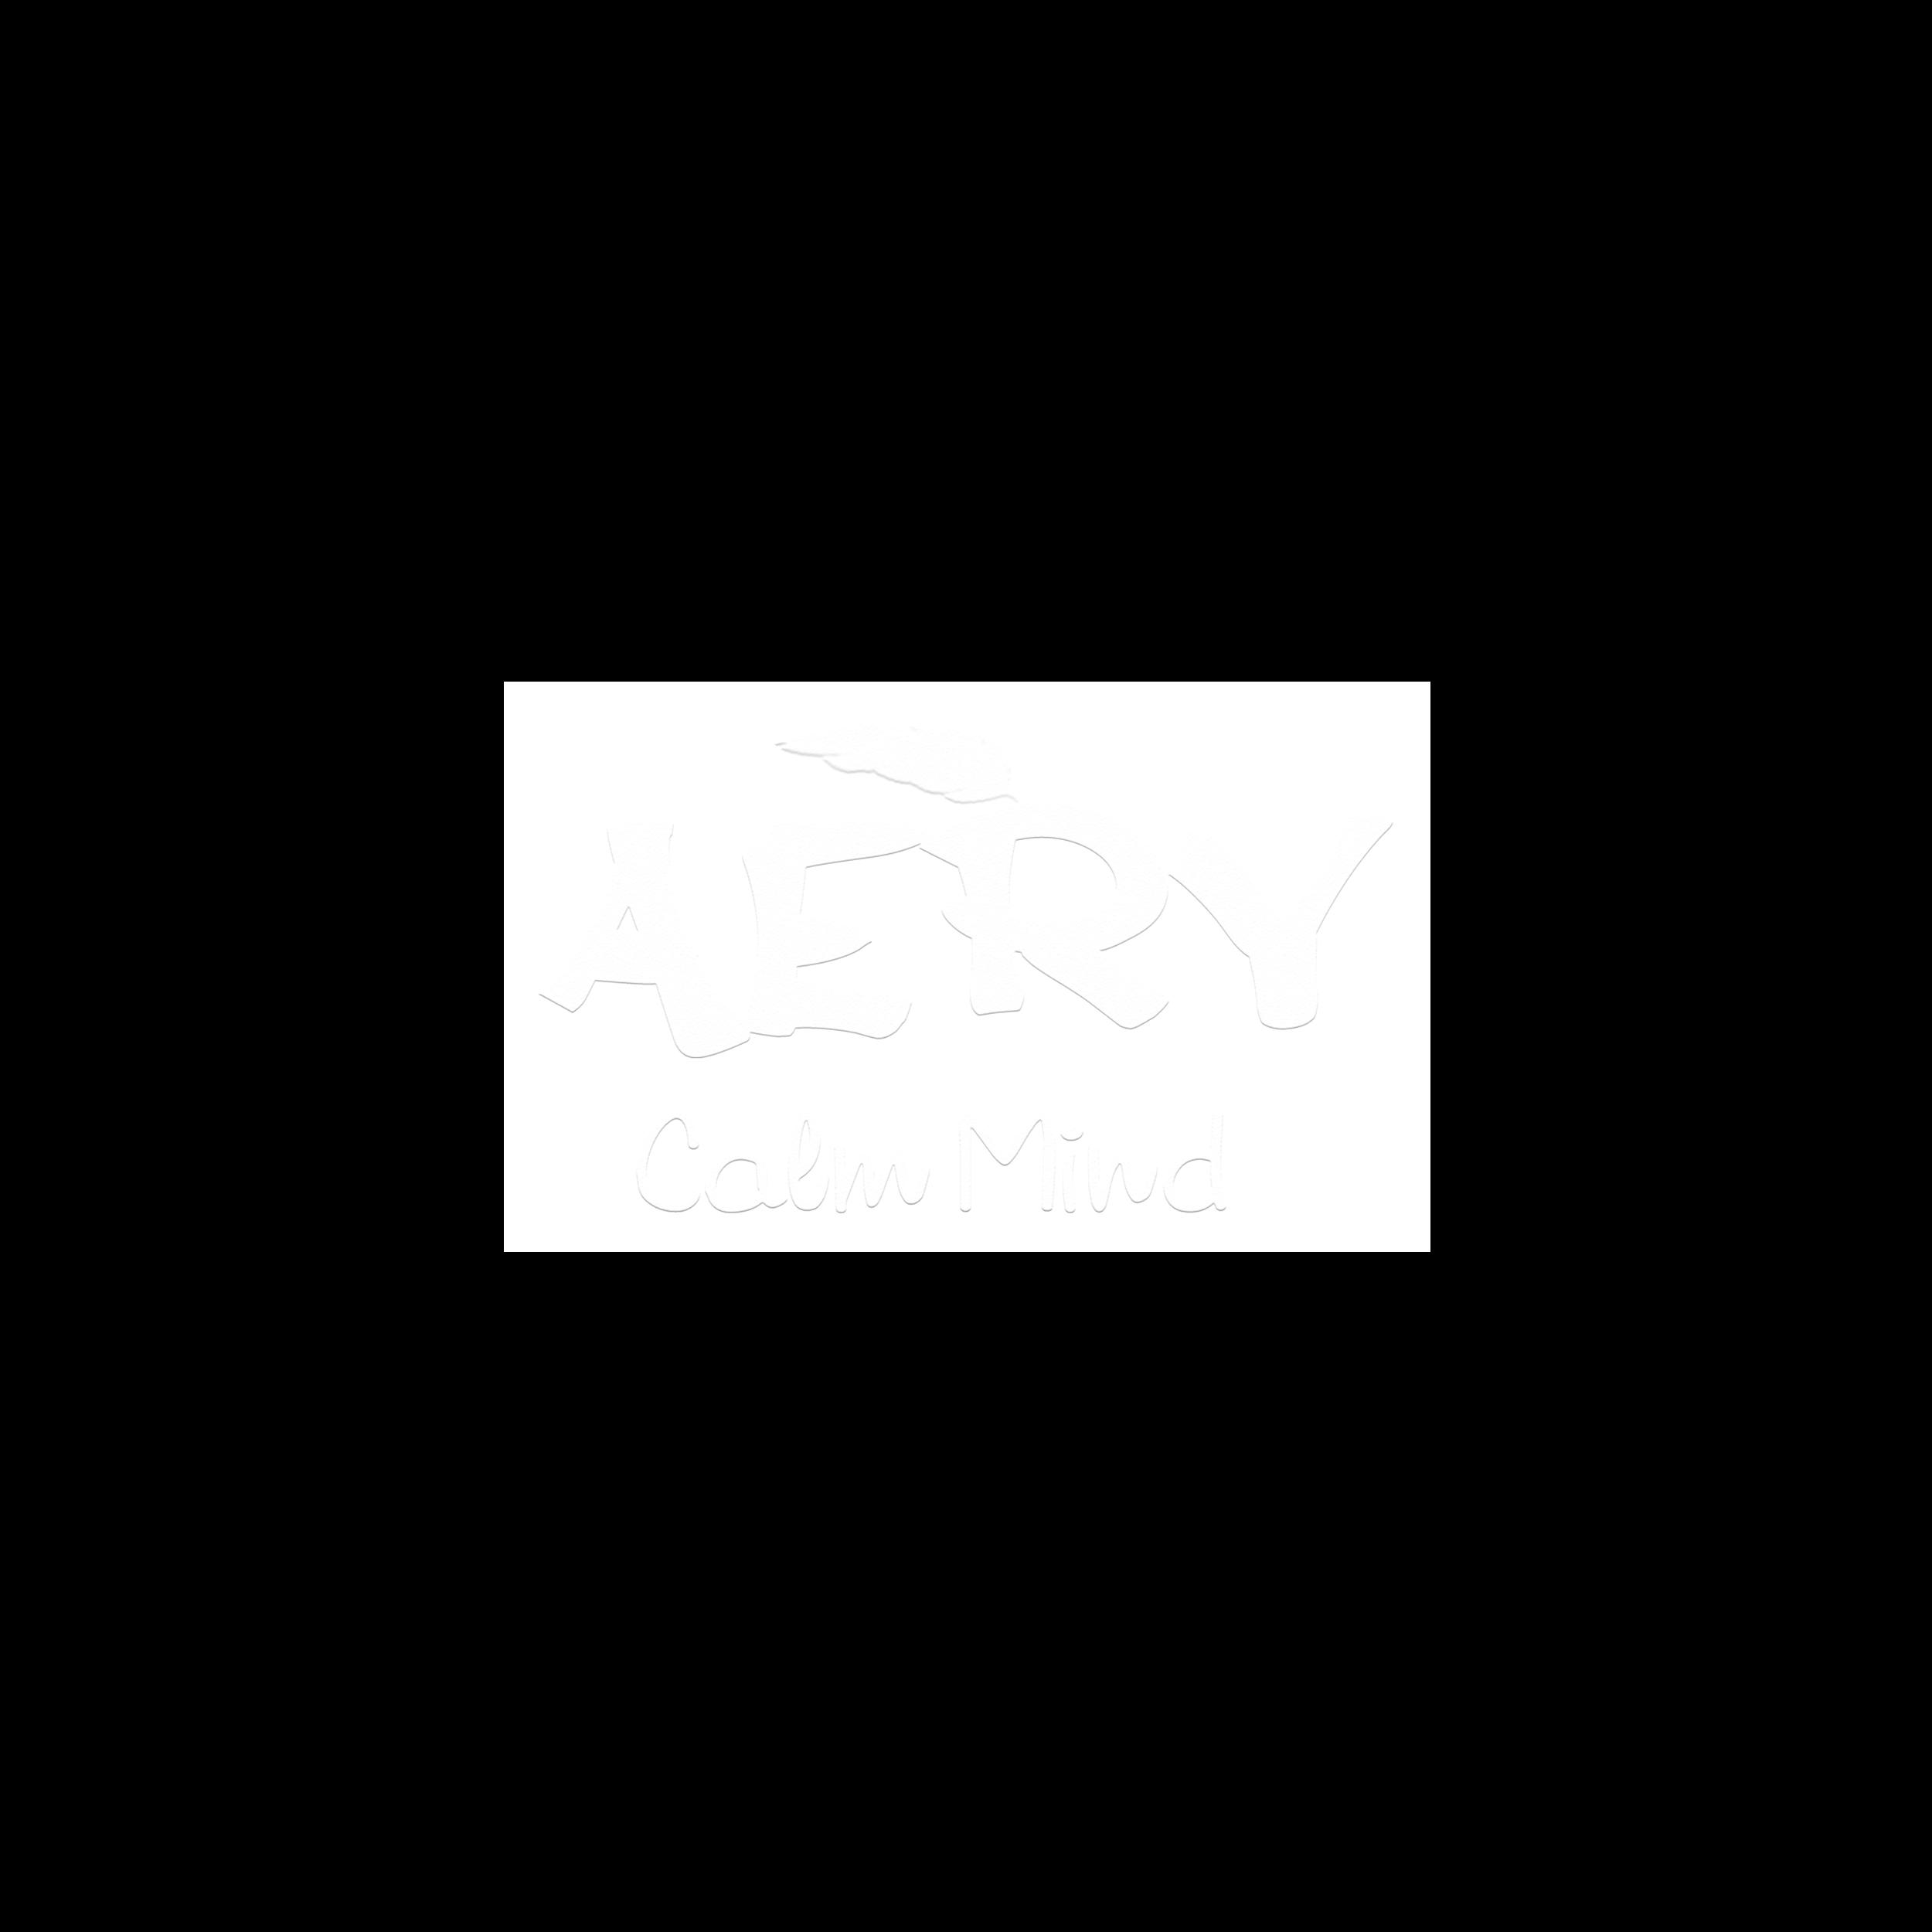 Aery - Calm Mind logo